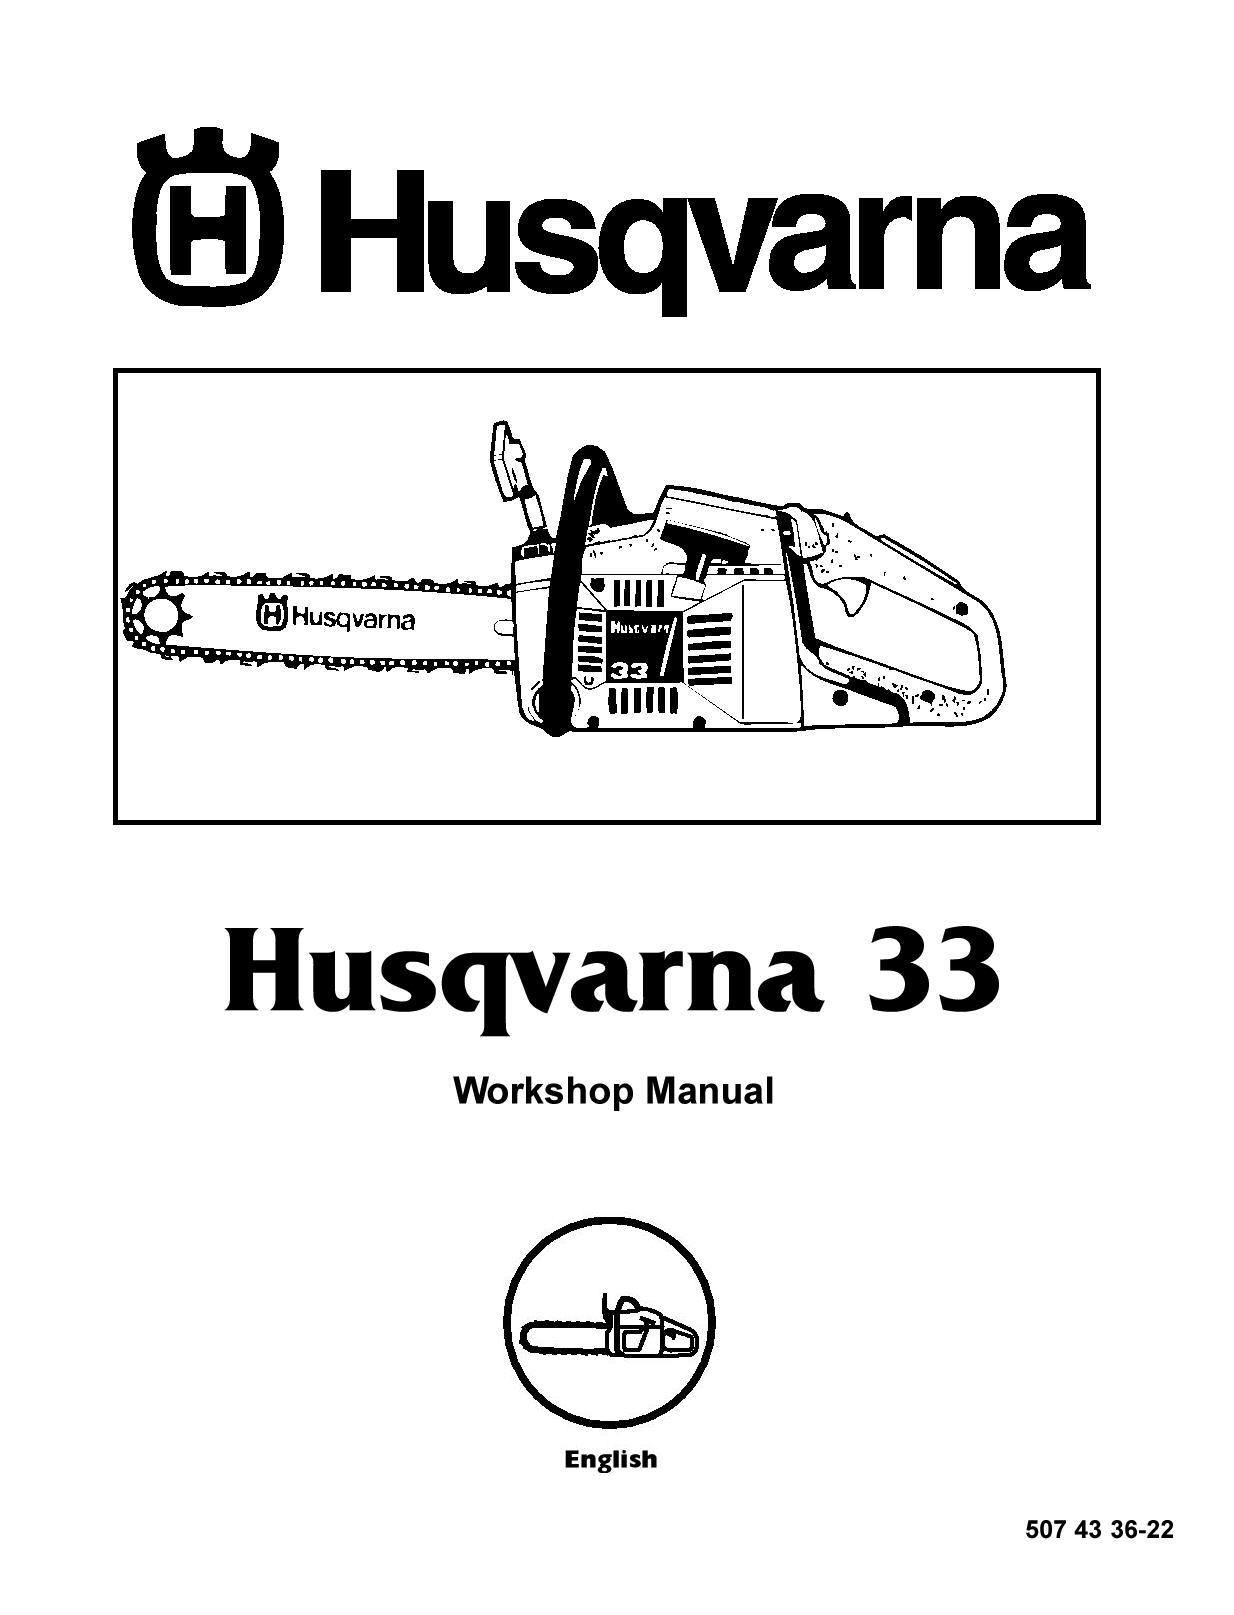 Husqvarna Chainsaw Workshop Manual Model 33 Manual Guide